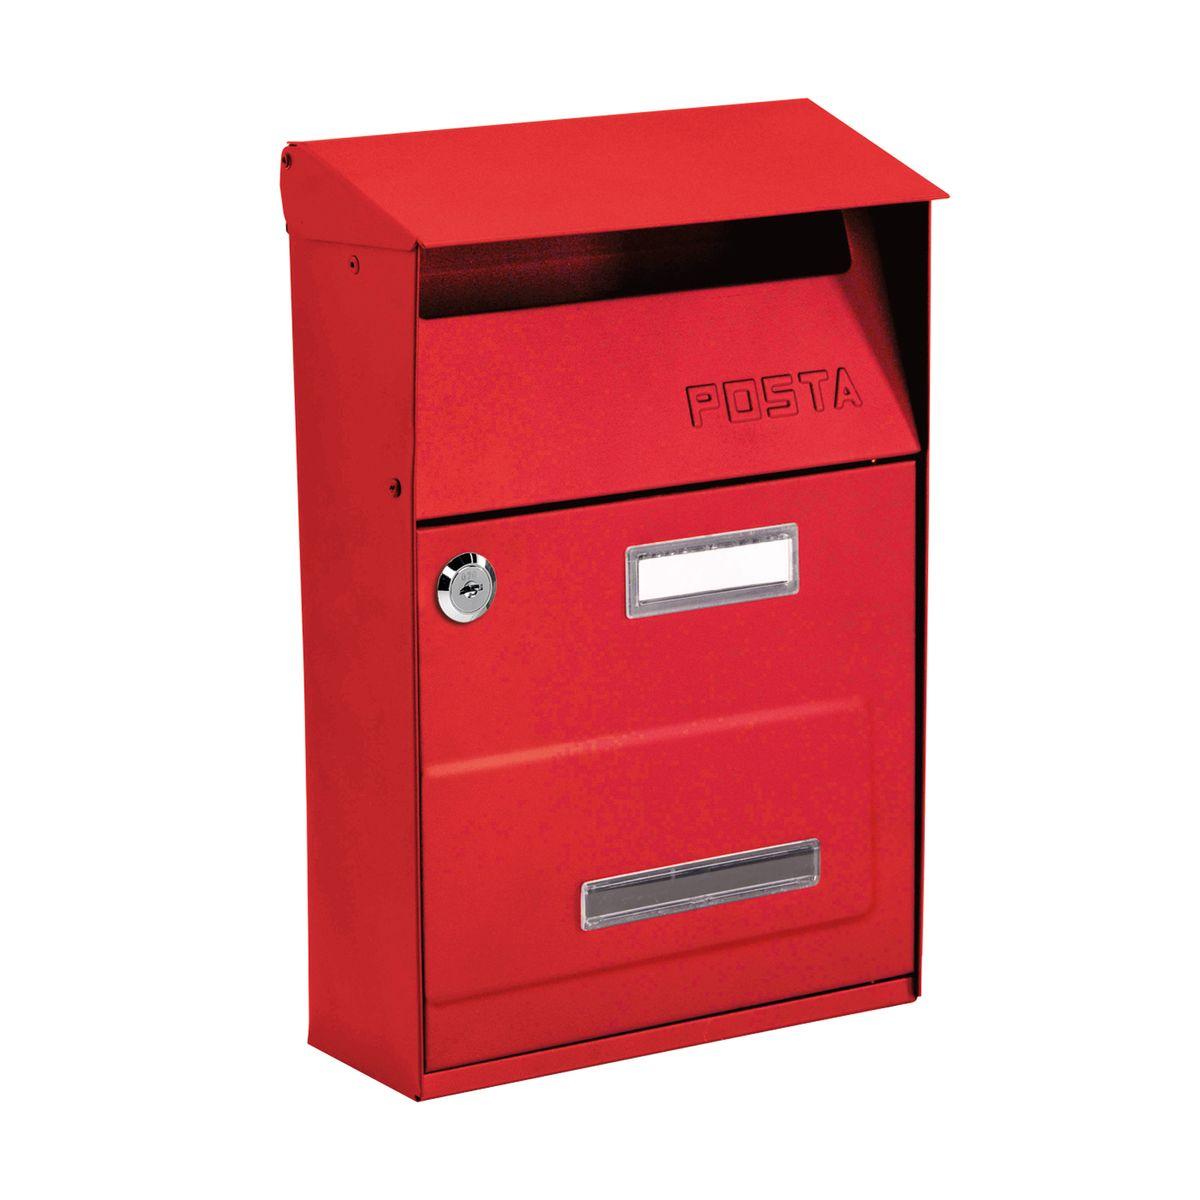 Cassetta della posta in legno best kesper tagliere for Leroy merlin tagliere